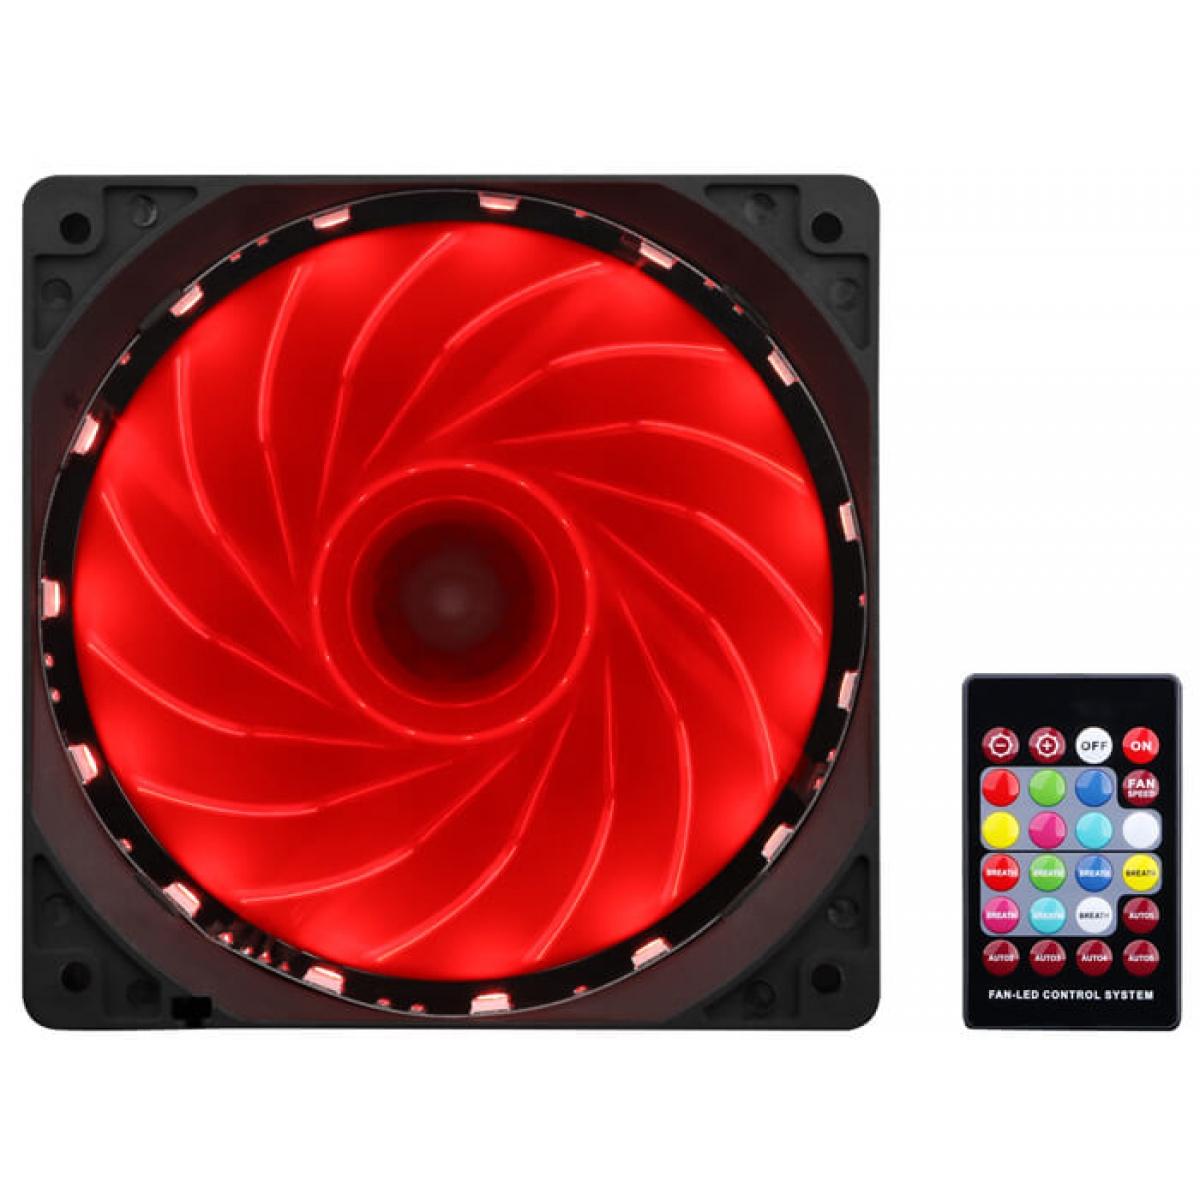 Kit Fan com 3 Unidades Redragon, RGB, 120mm, Com Controladora, GC-F006